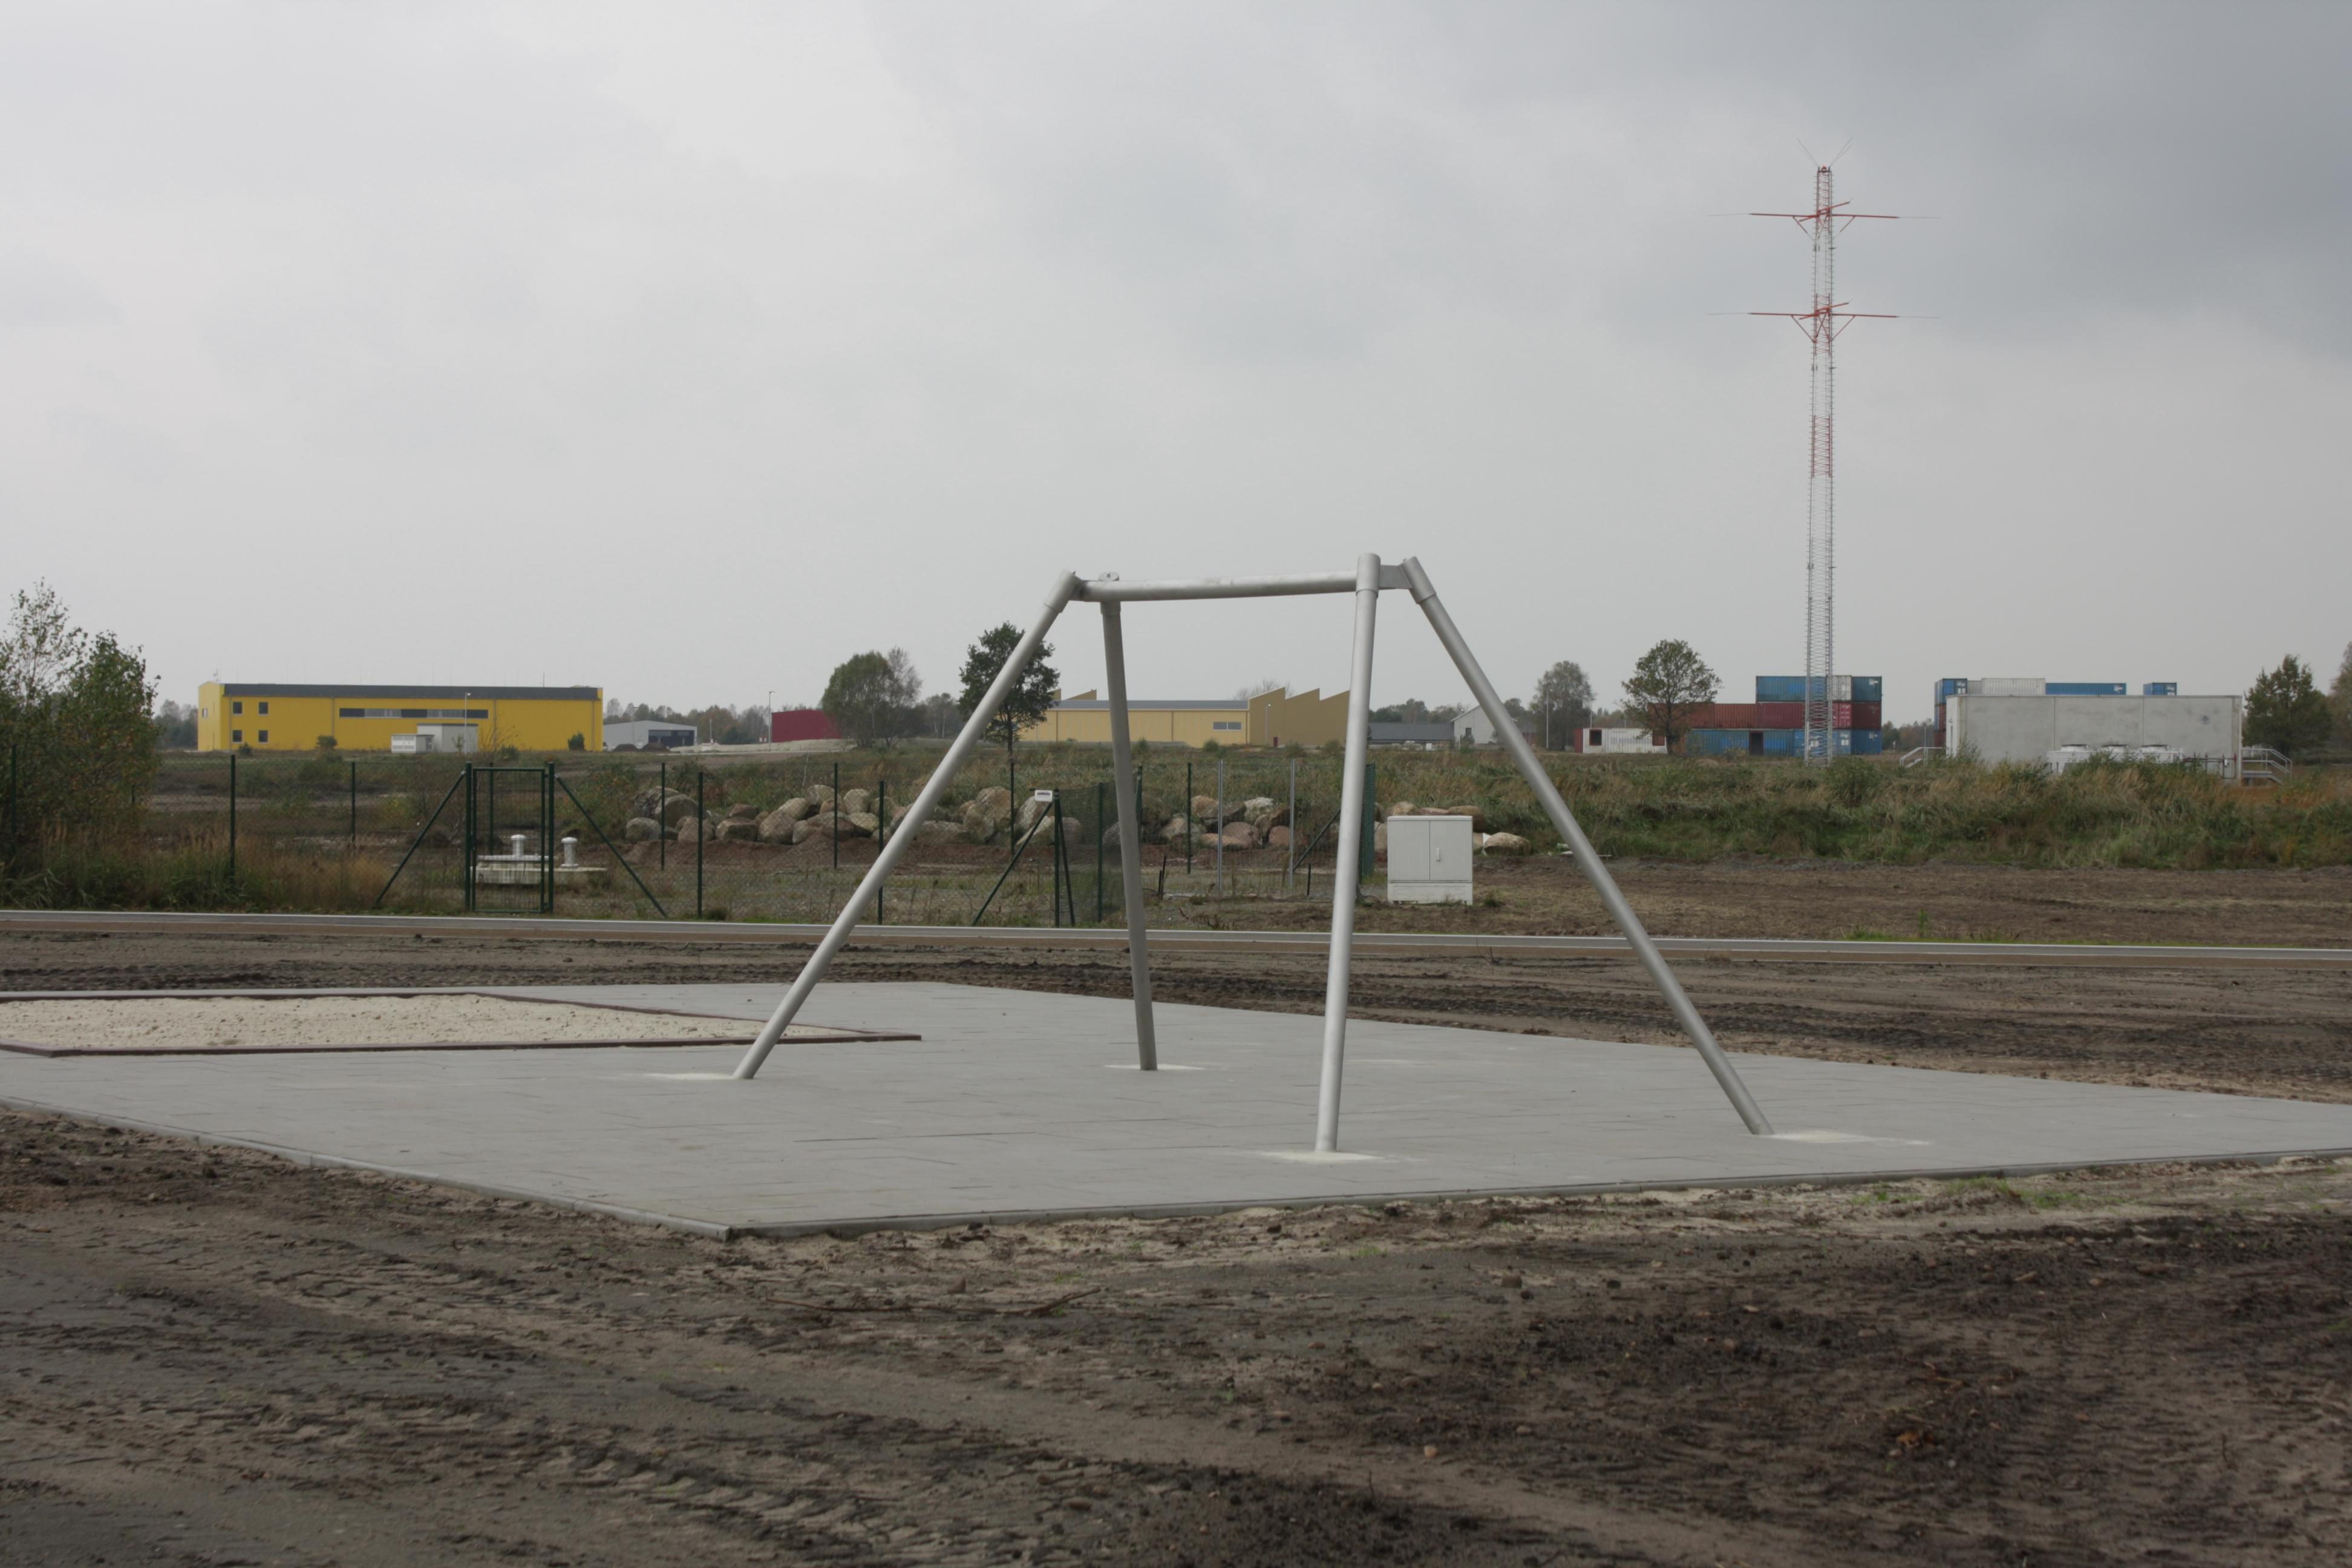 A playground.